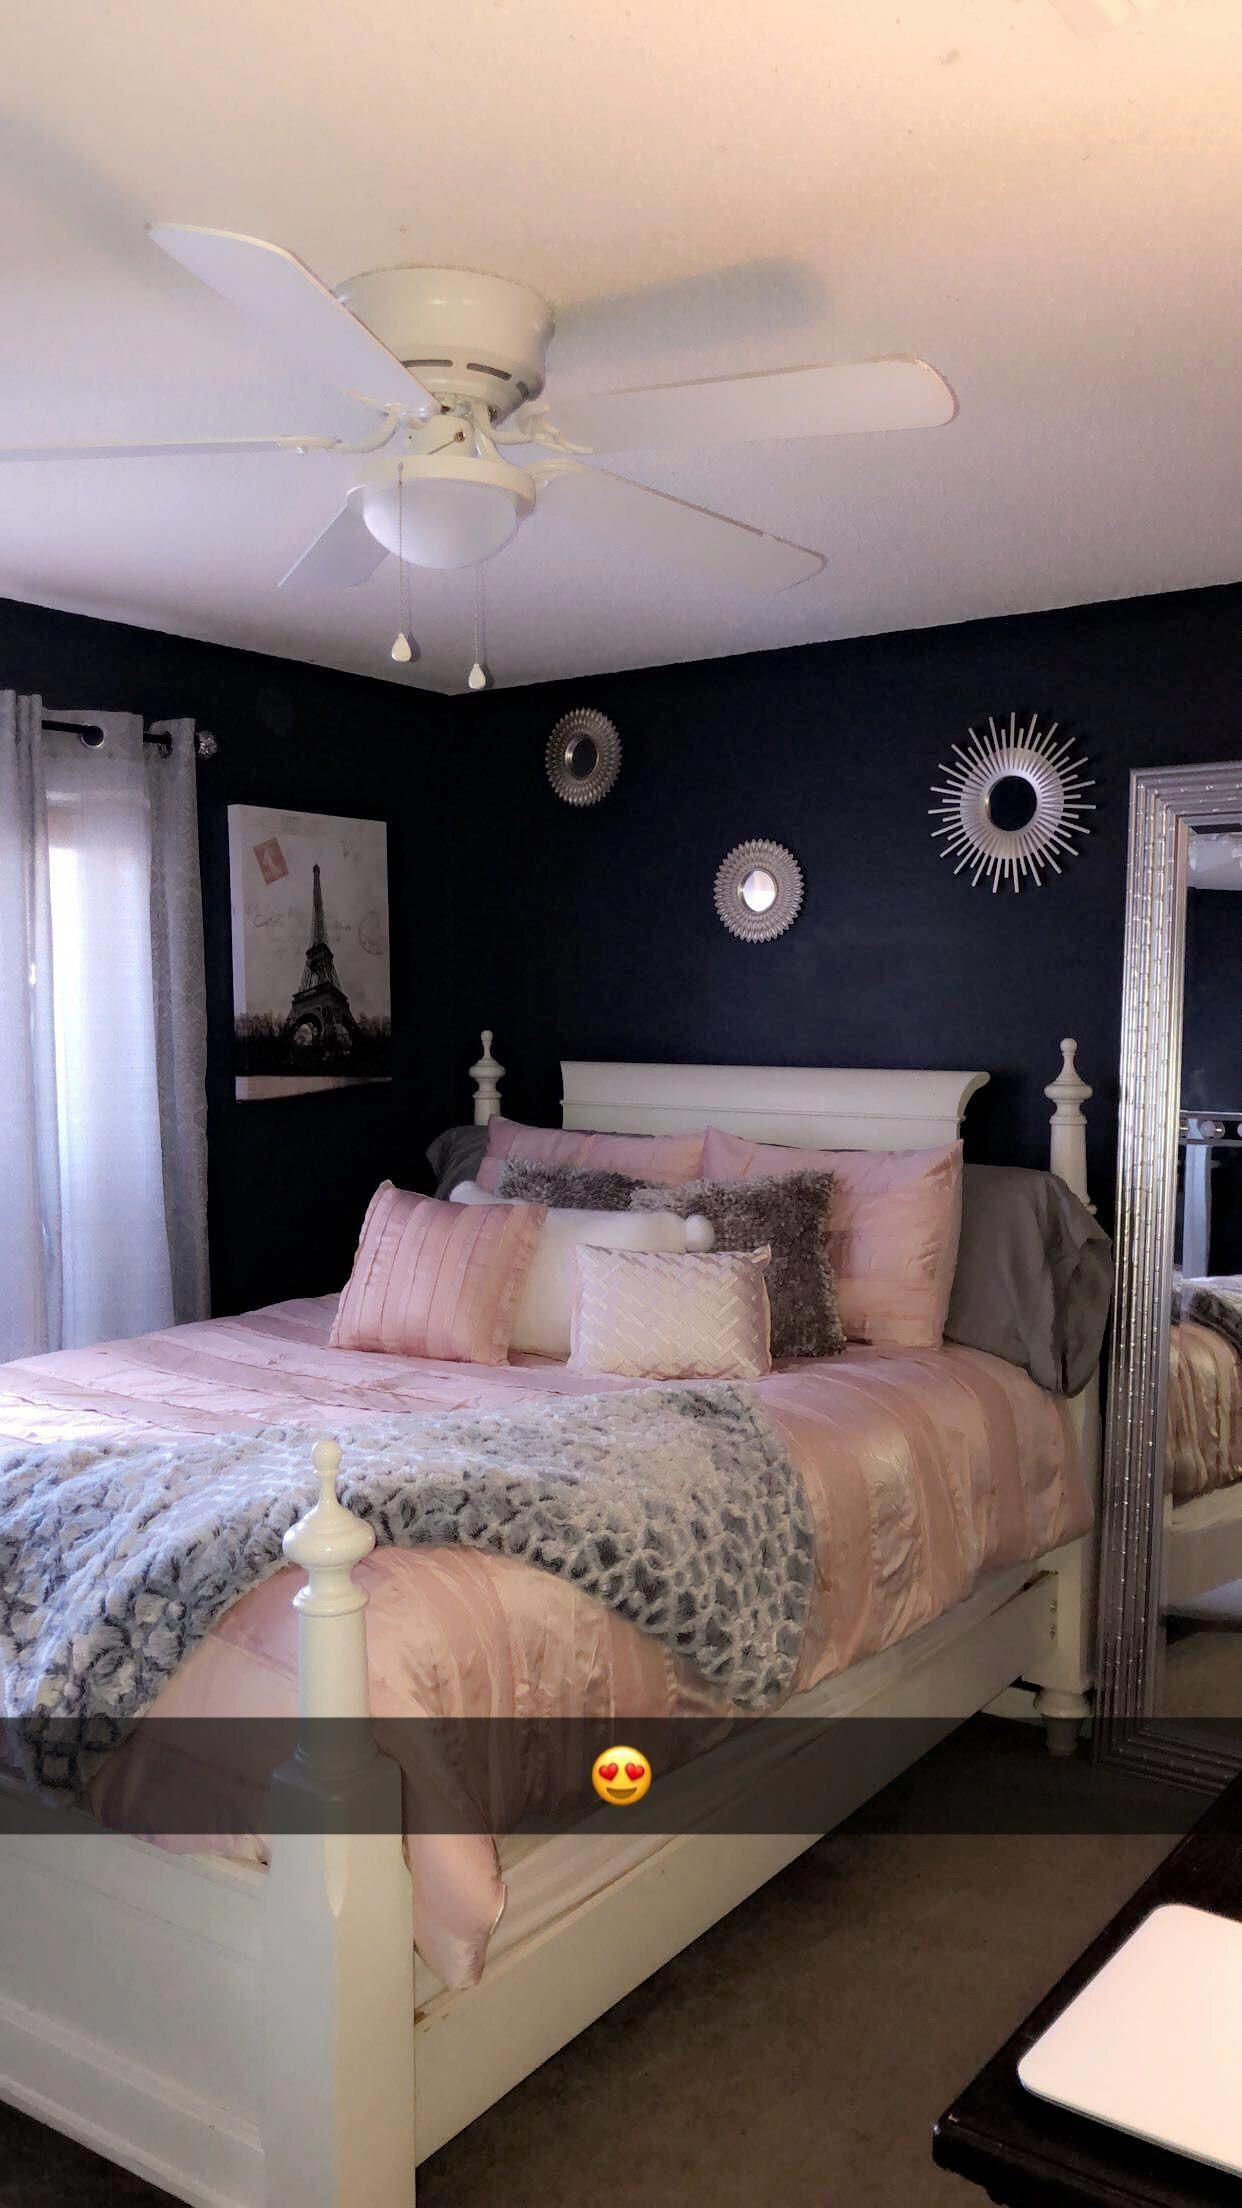 Teen bedroom teengirlbedroomideas also home decor neutral and blush future room ideas rh pinterest